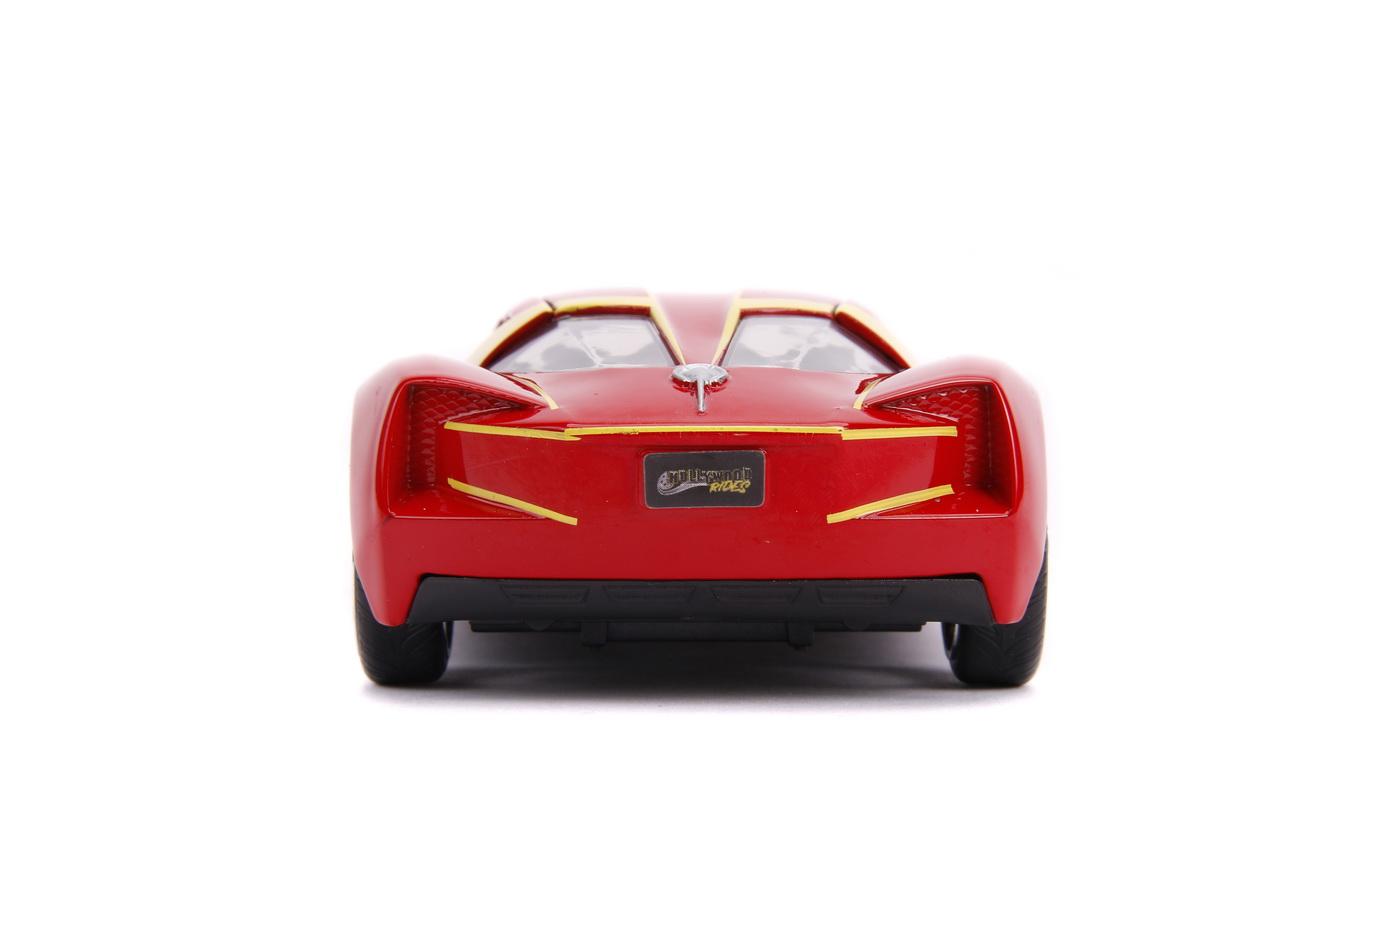 Masinuta Metalica Flash 2009 Chevy Corvette Scara 1 La 32 | JadaToys - 3